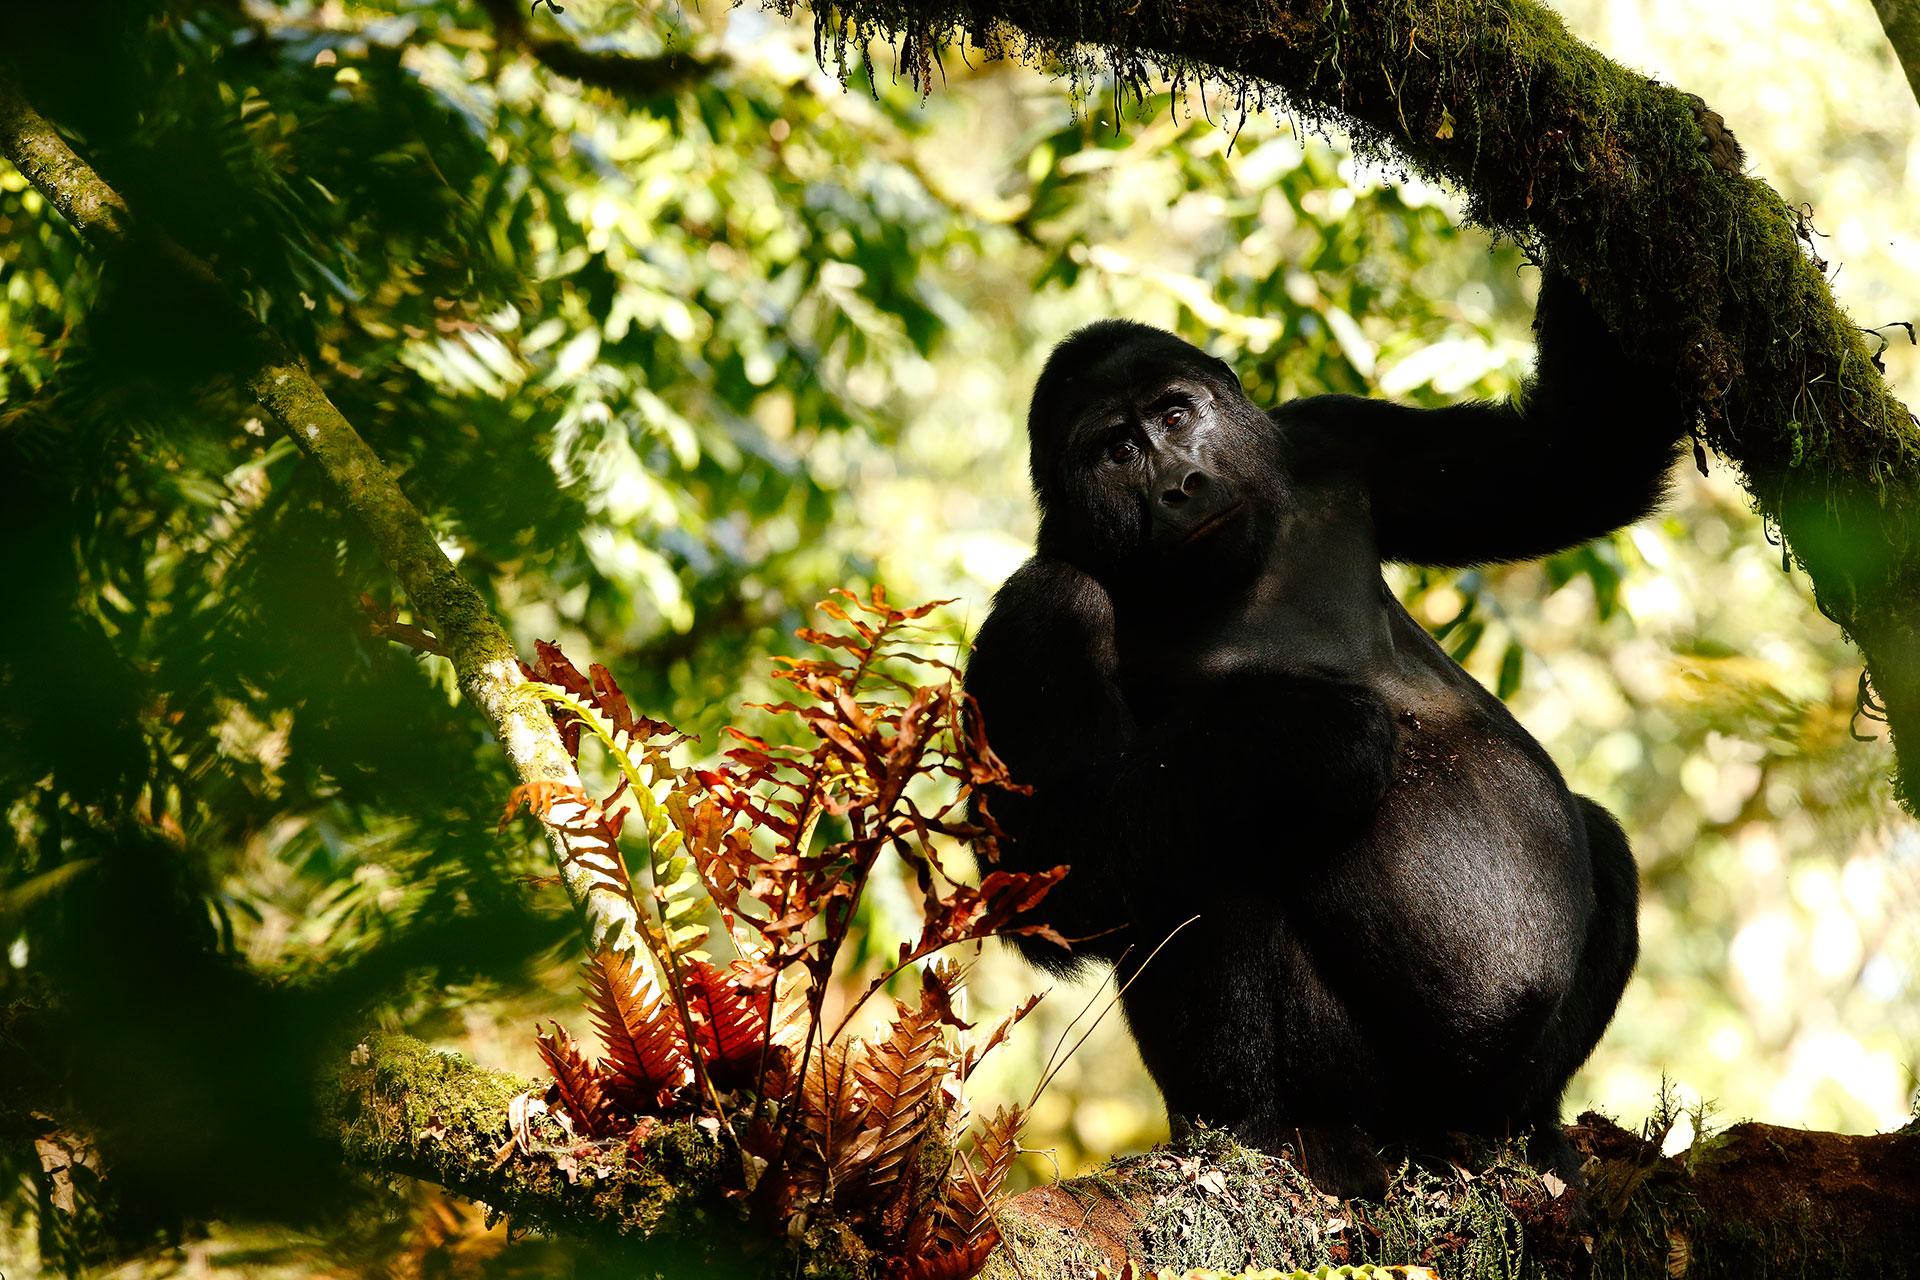 Gorilla is pregnant...